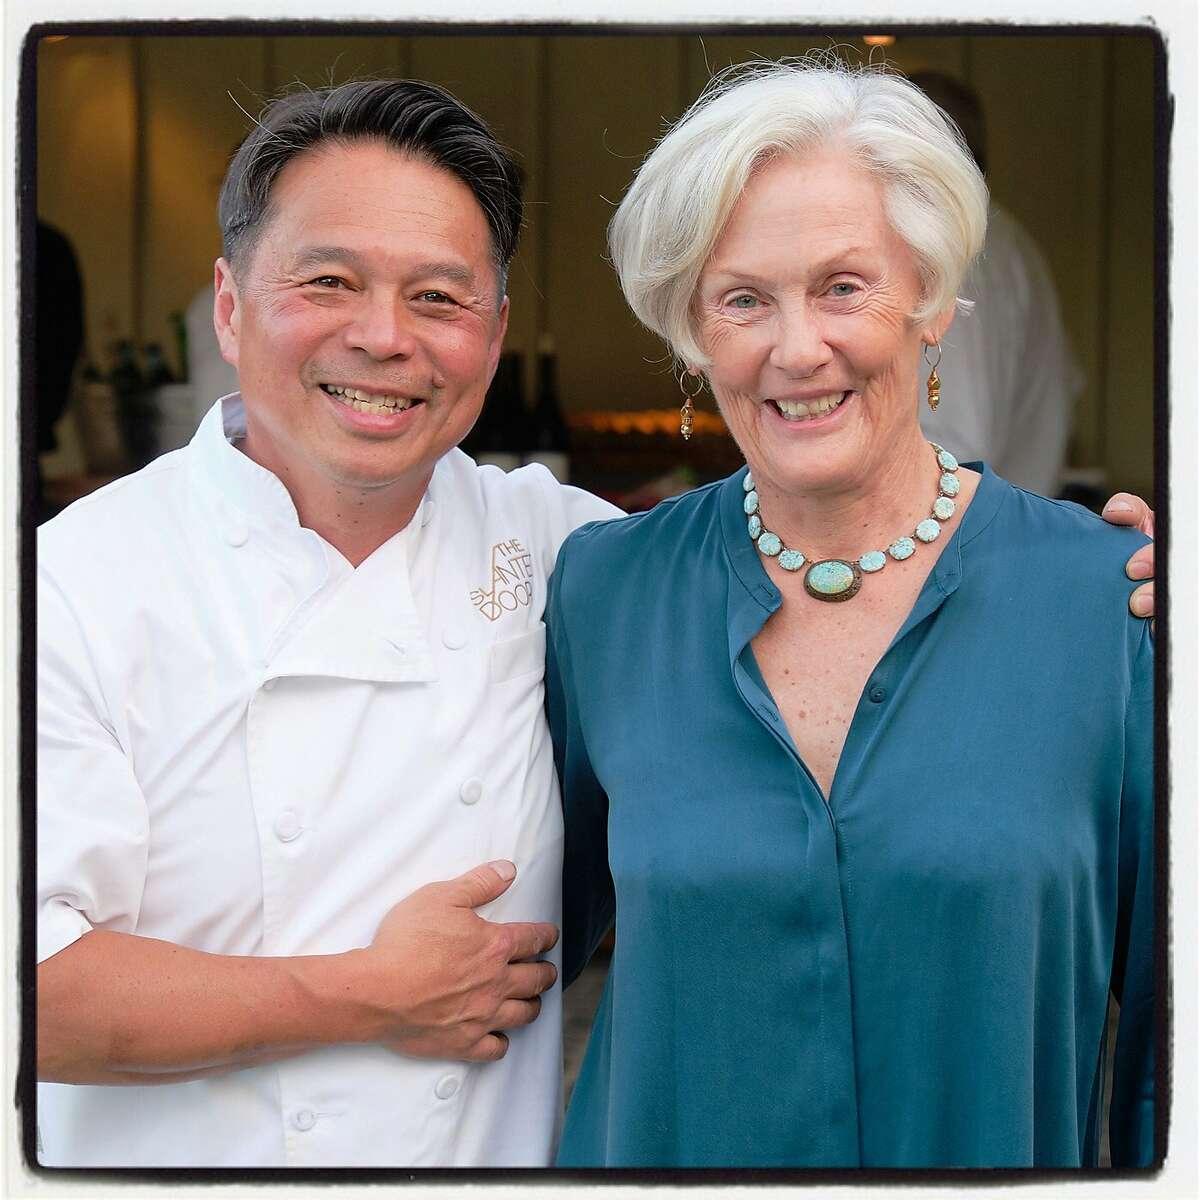 Chef Charles Phan and Napa vintner Ann Grace at the V Foundation Wine Celebration. August 2029.